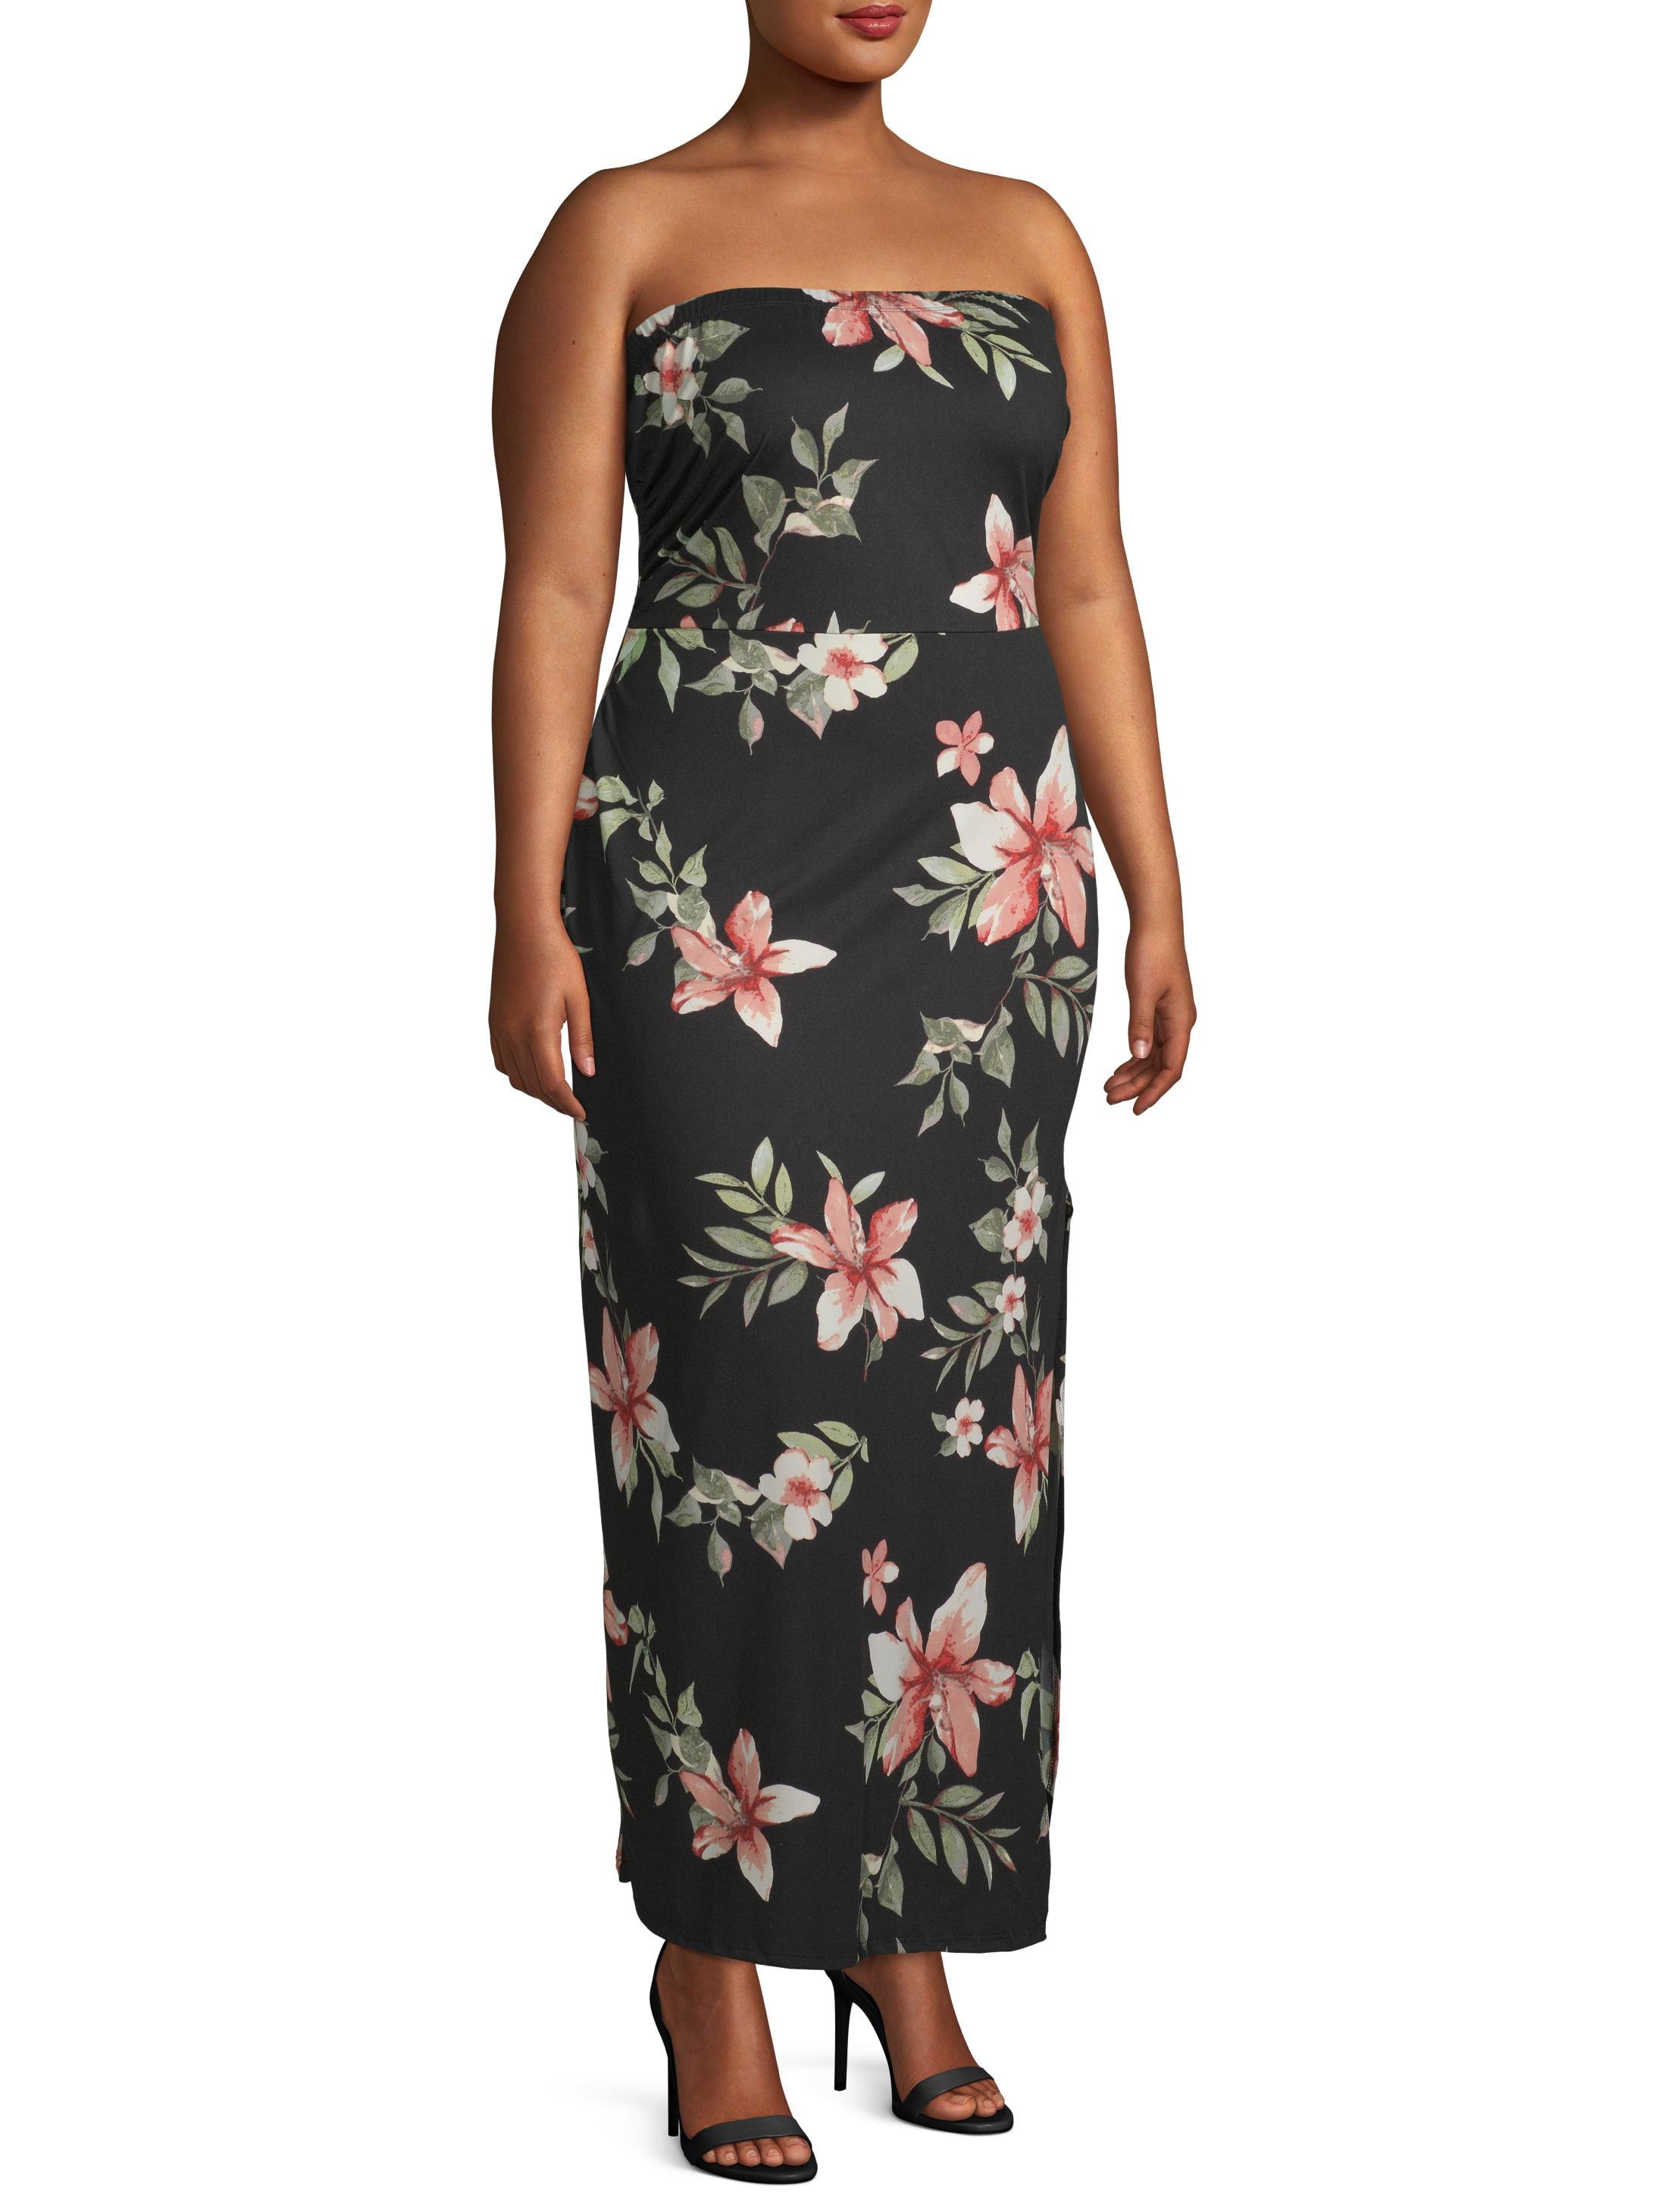 Juniors\' Plus Size Tube Top Maxi Dress